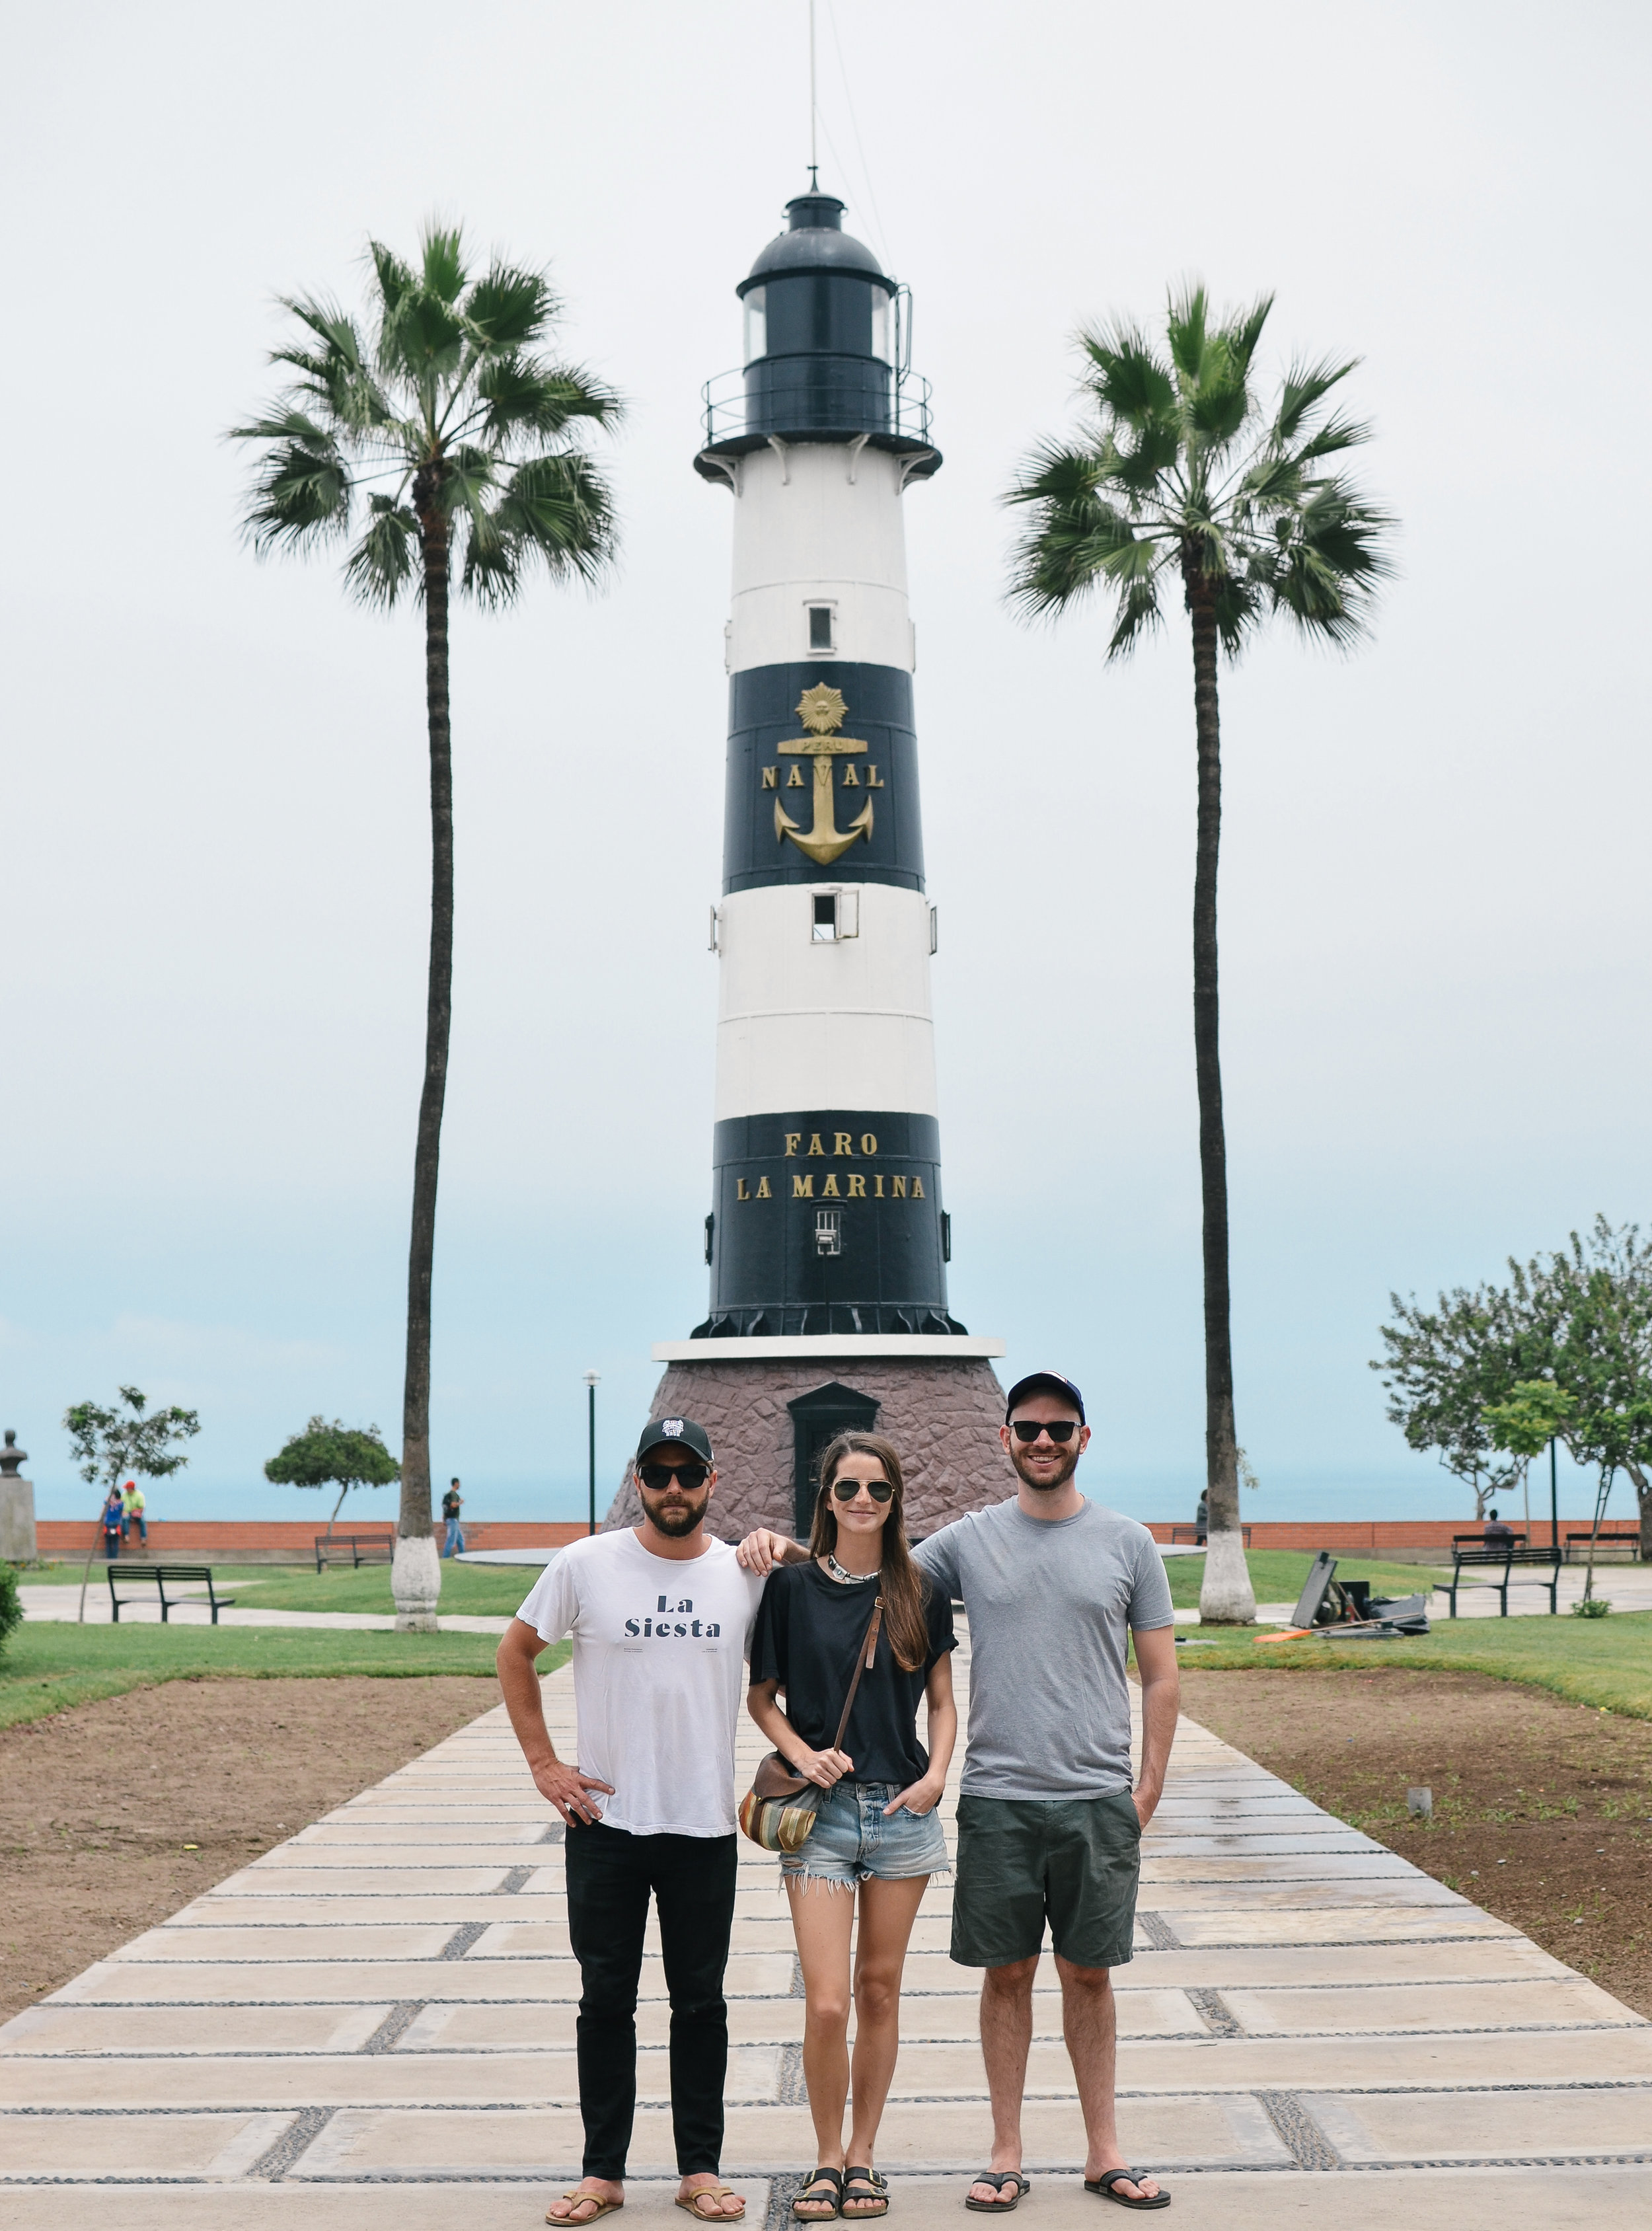 lima+peru+travel+guide+life+on+pine+blog +exchange_DSC_1619.jpg